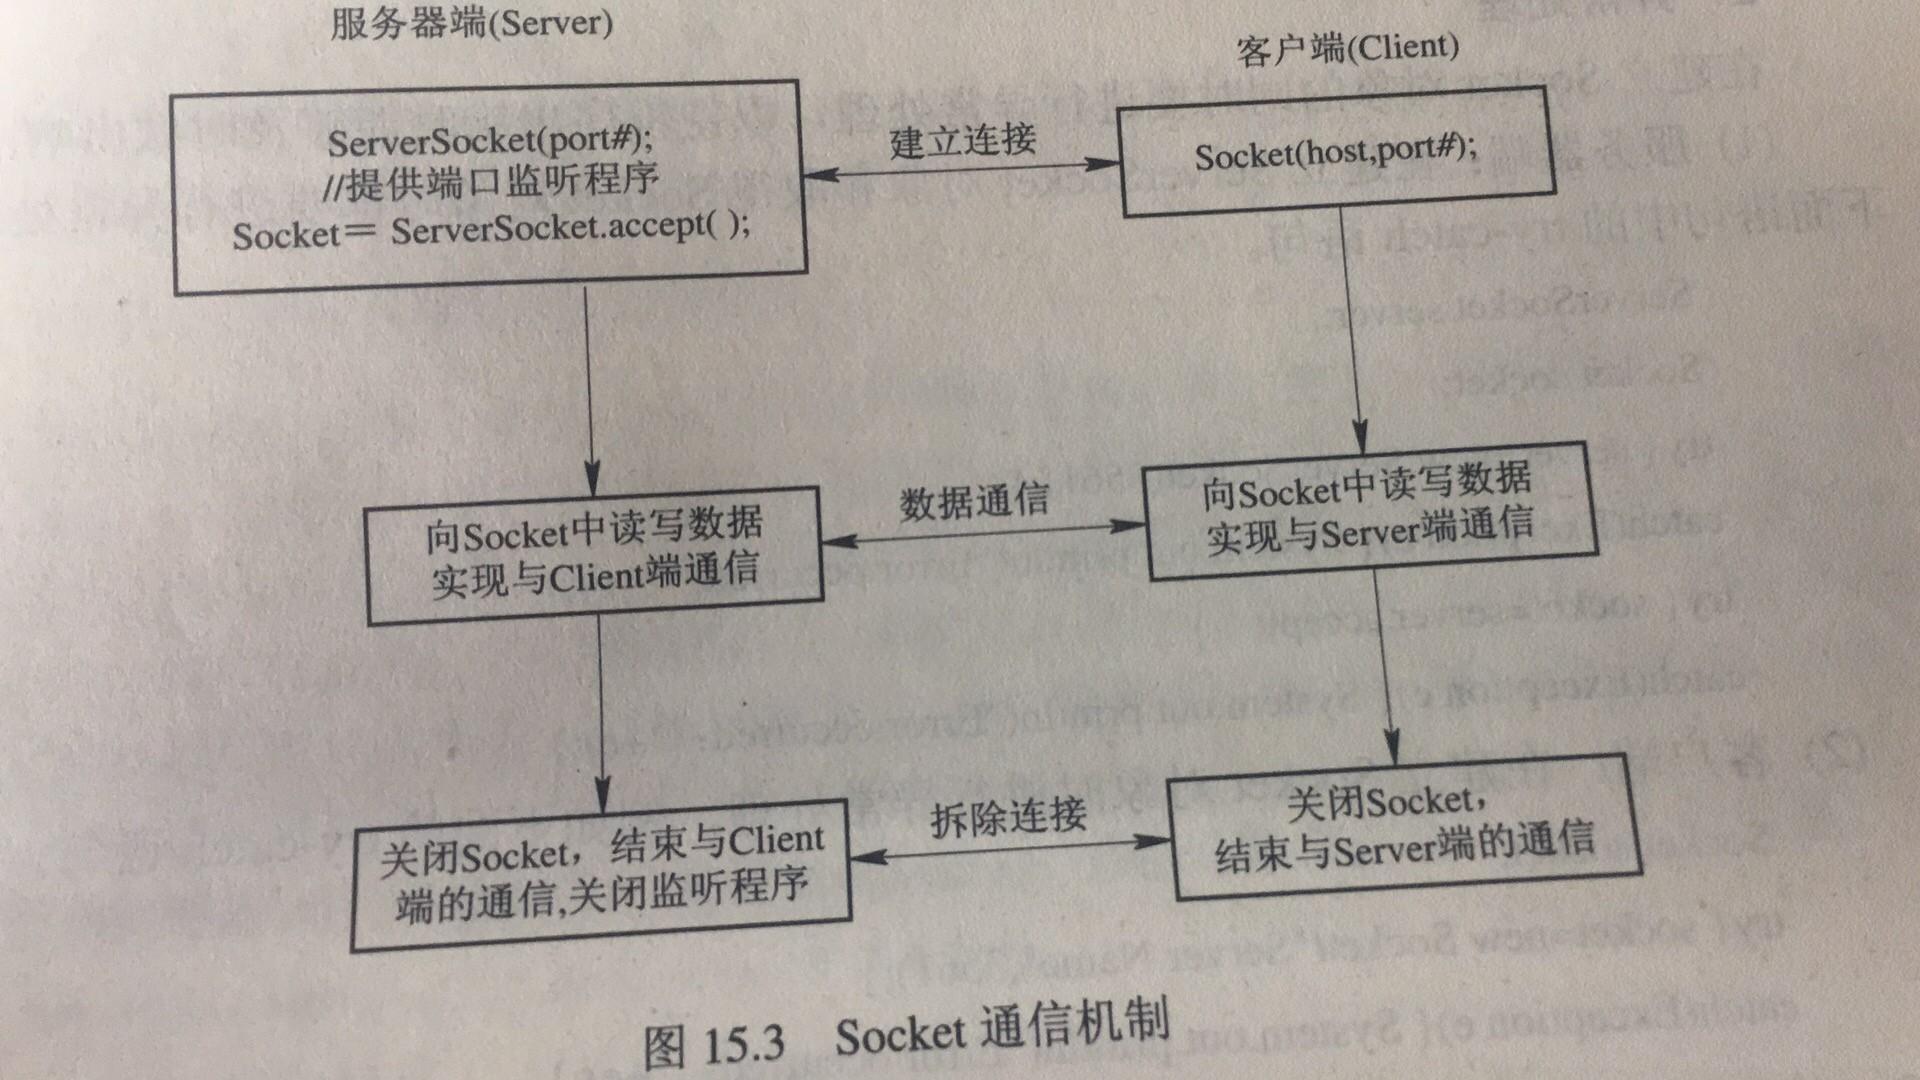 Socket programming java implementation - Programmer Sought